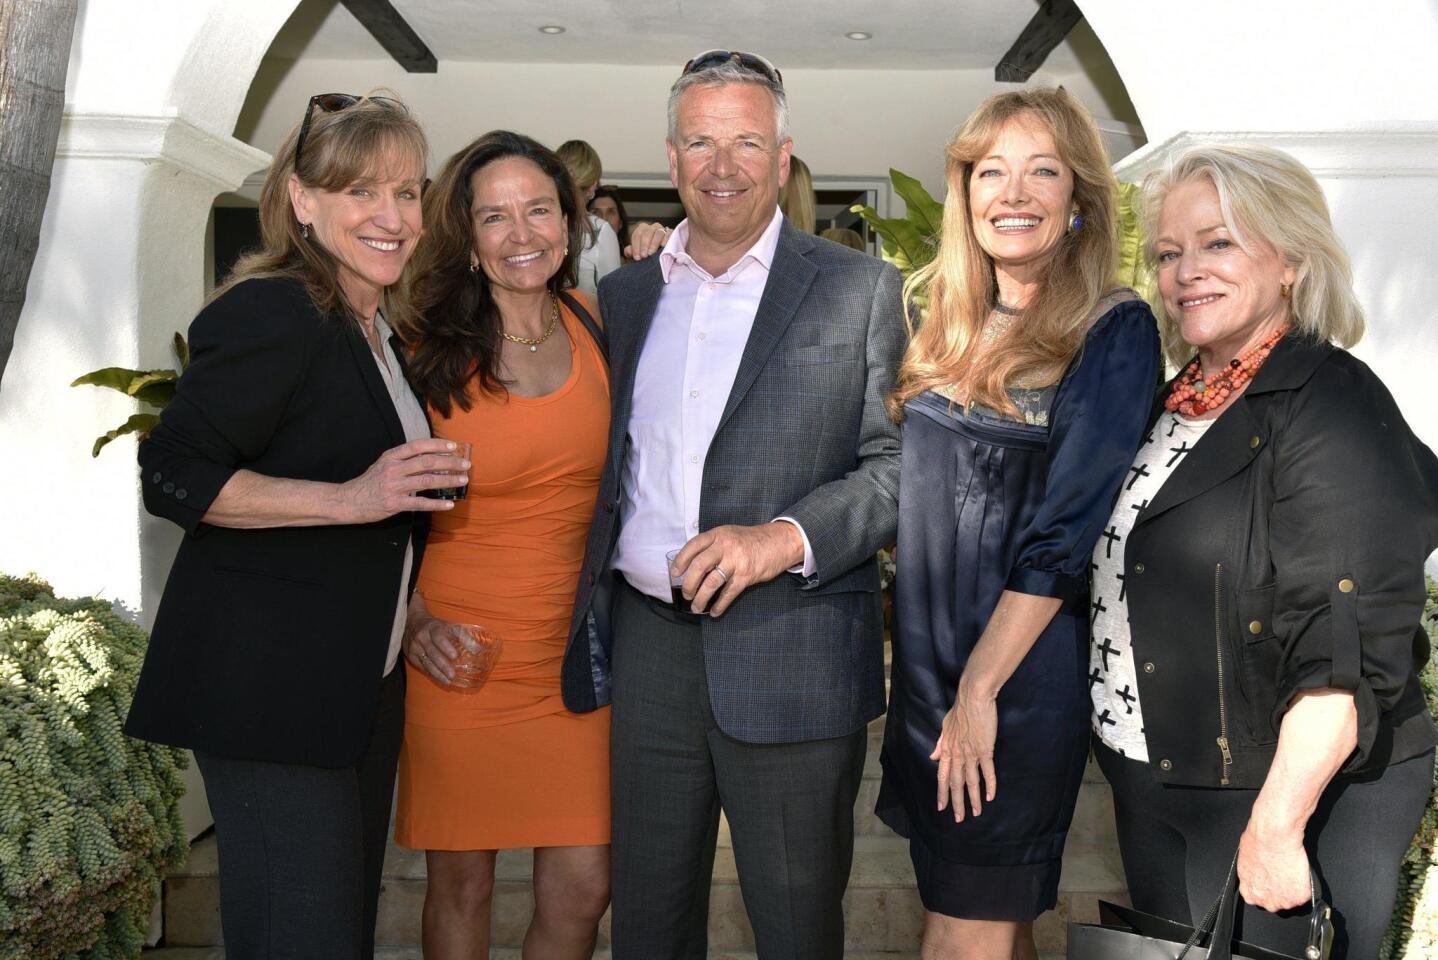 Jennifer Lee, Pelin and Scott Thorogood, Susan Leonard, Cathe Burnham